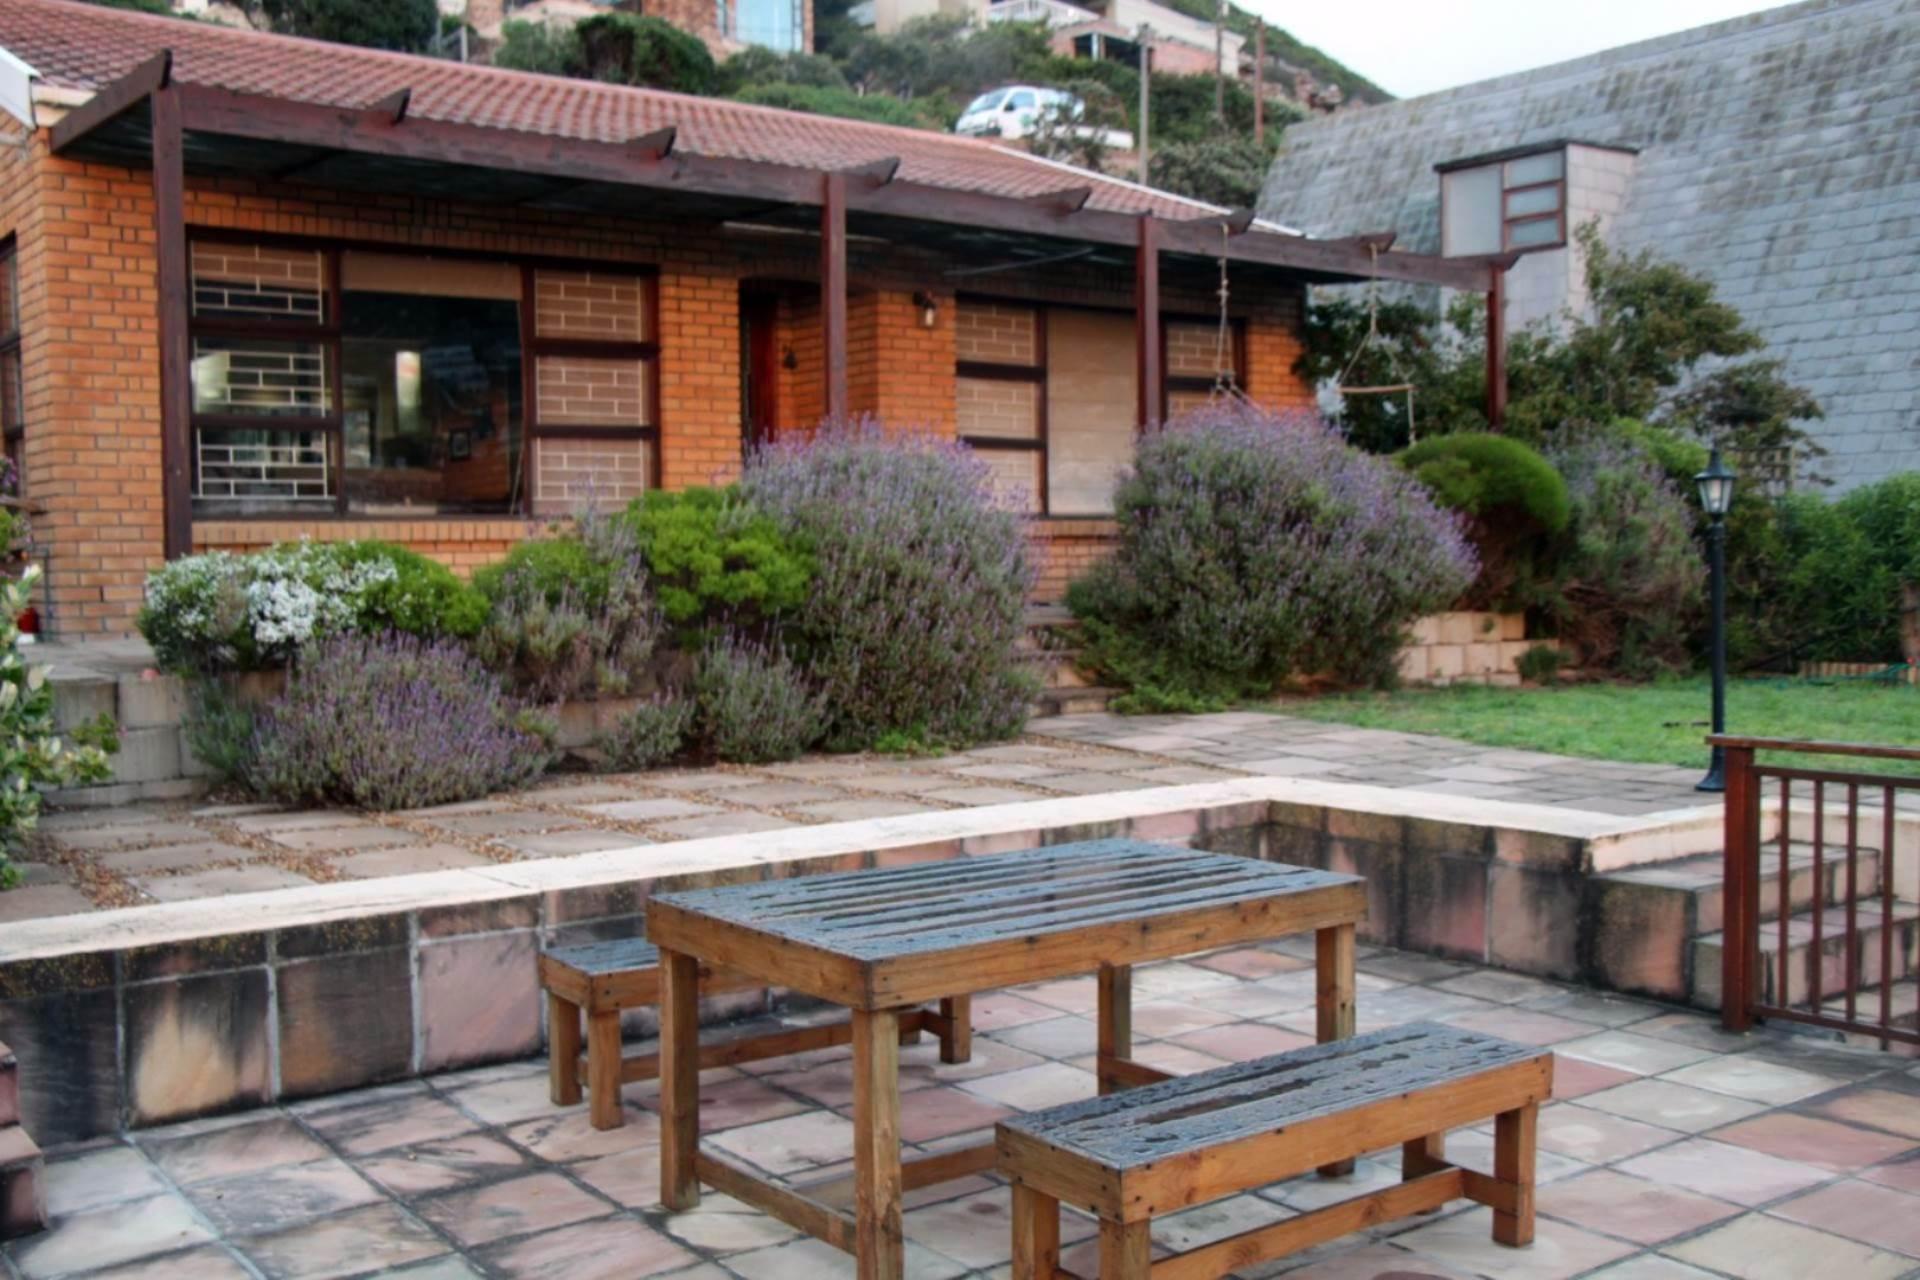 2 BedroomHouse To Rent In Glencairn